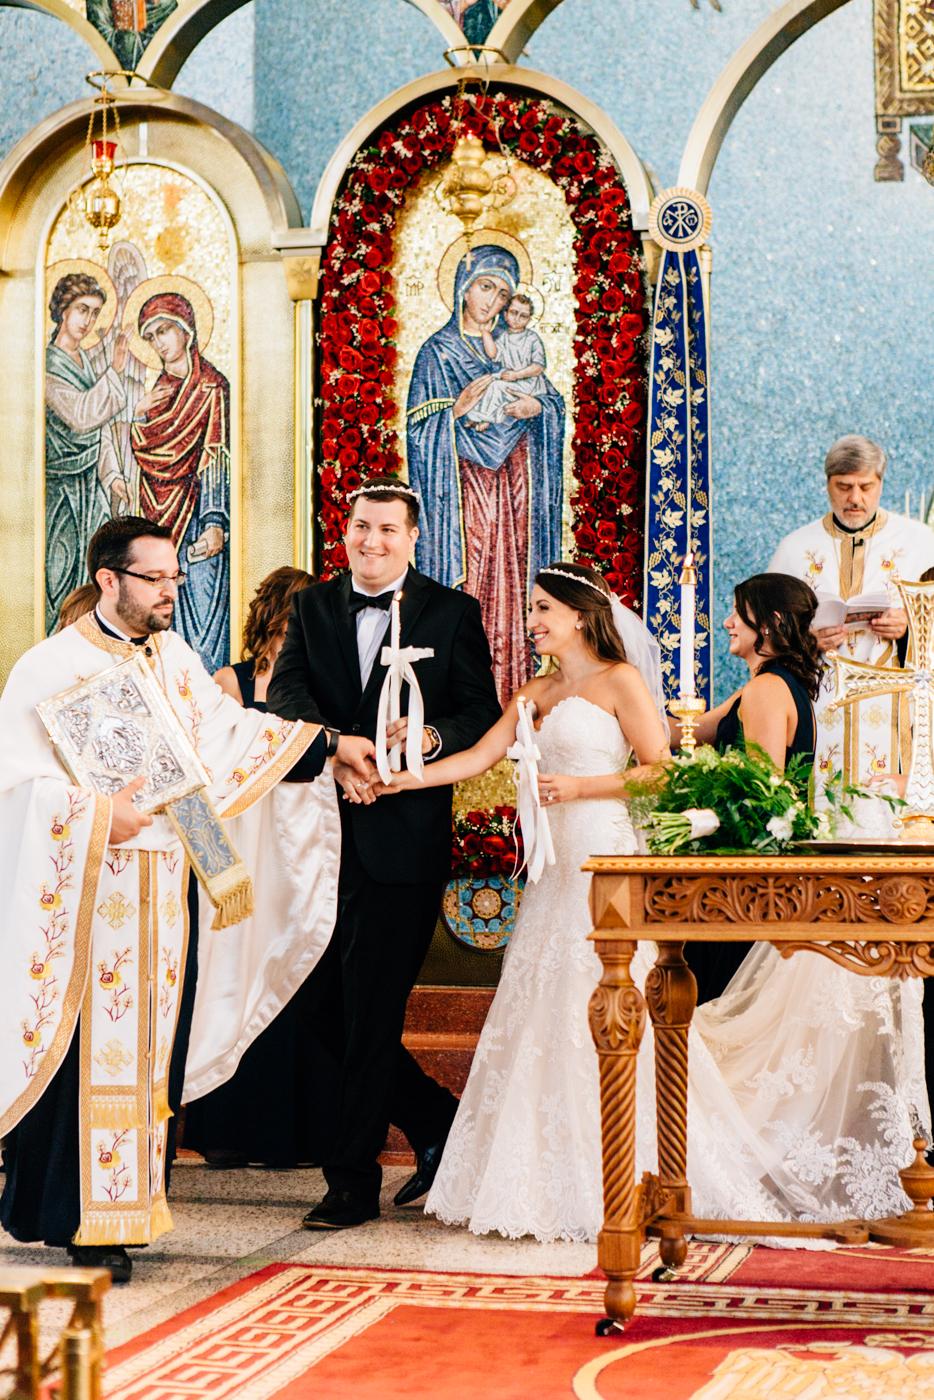 four corners photography greek wedding atlanta greek wedding photographer Annunciation Greek Orthodox Cathedral atlanta wedding photographer (29 of 69).jpg